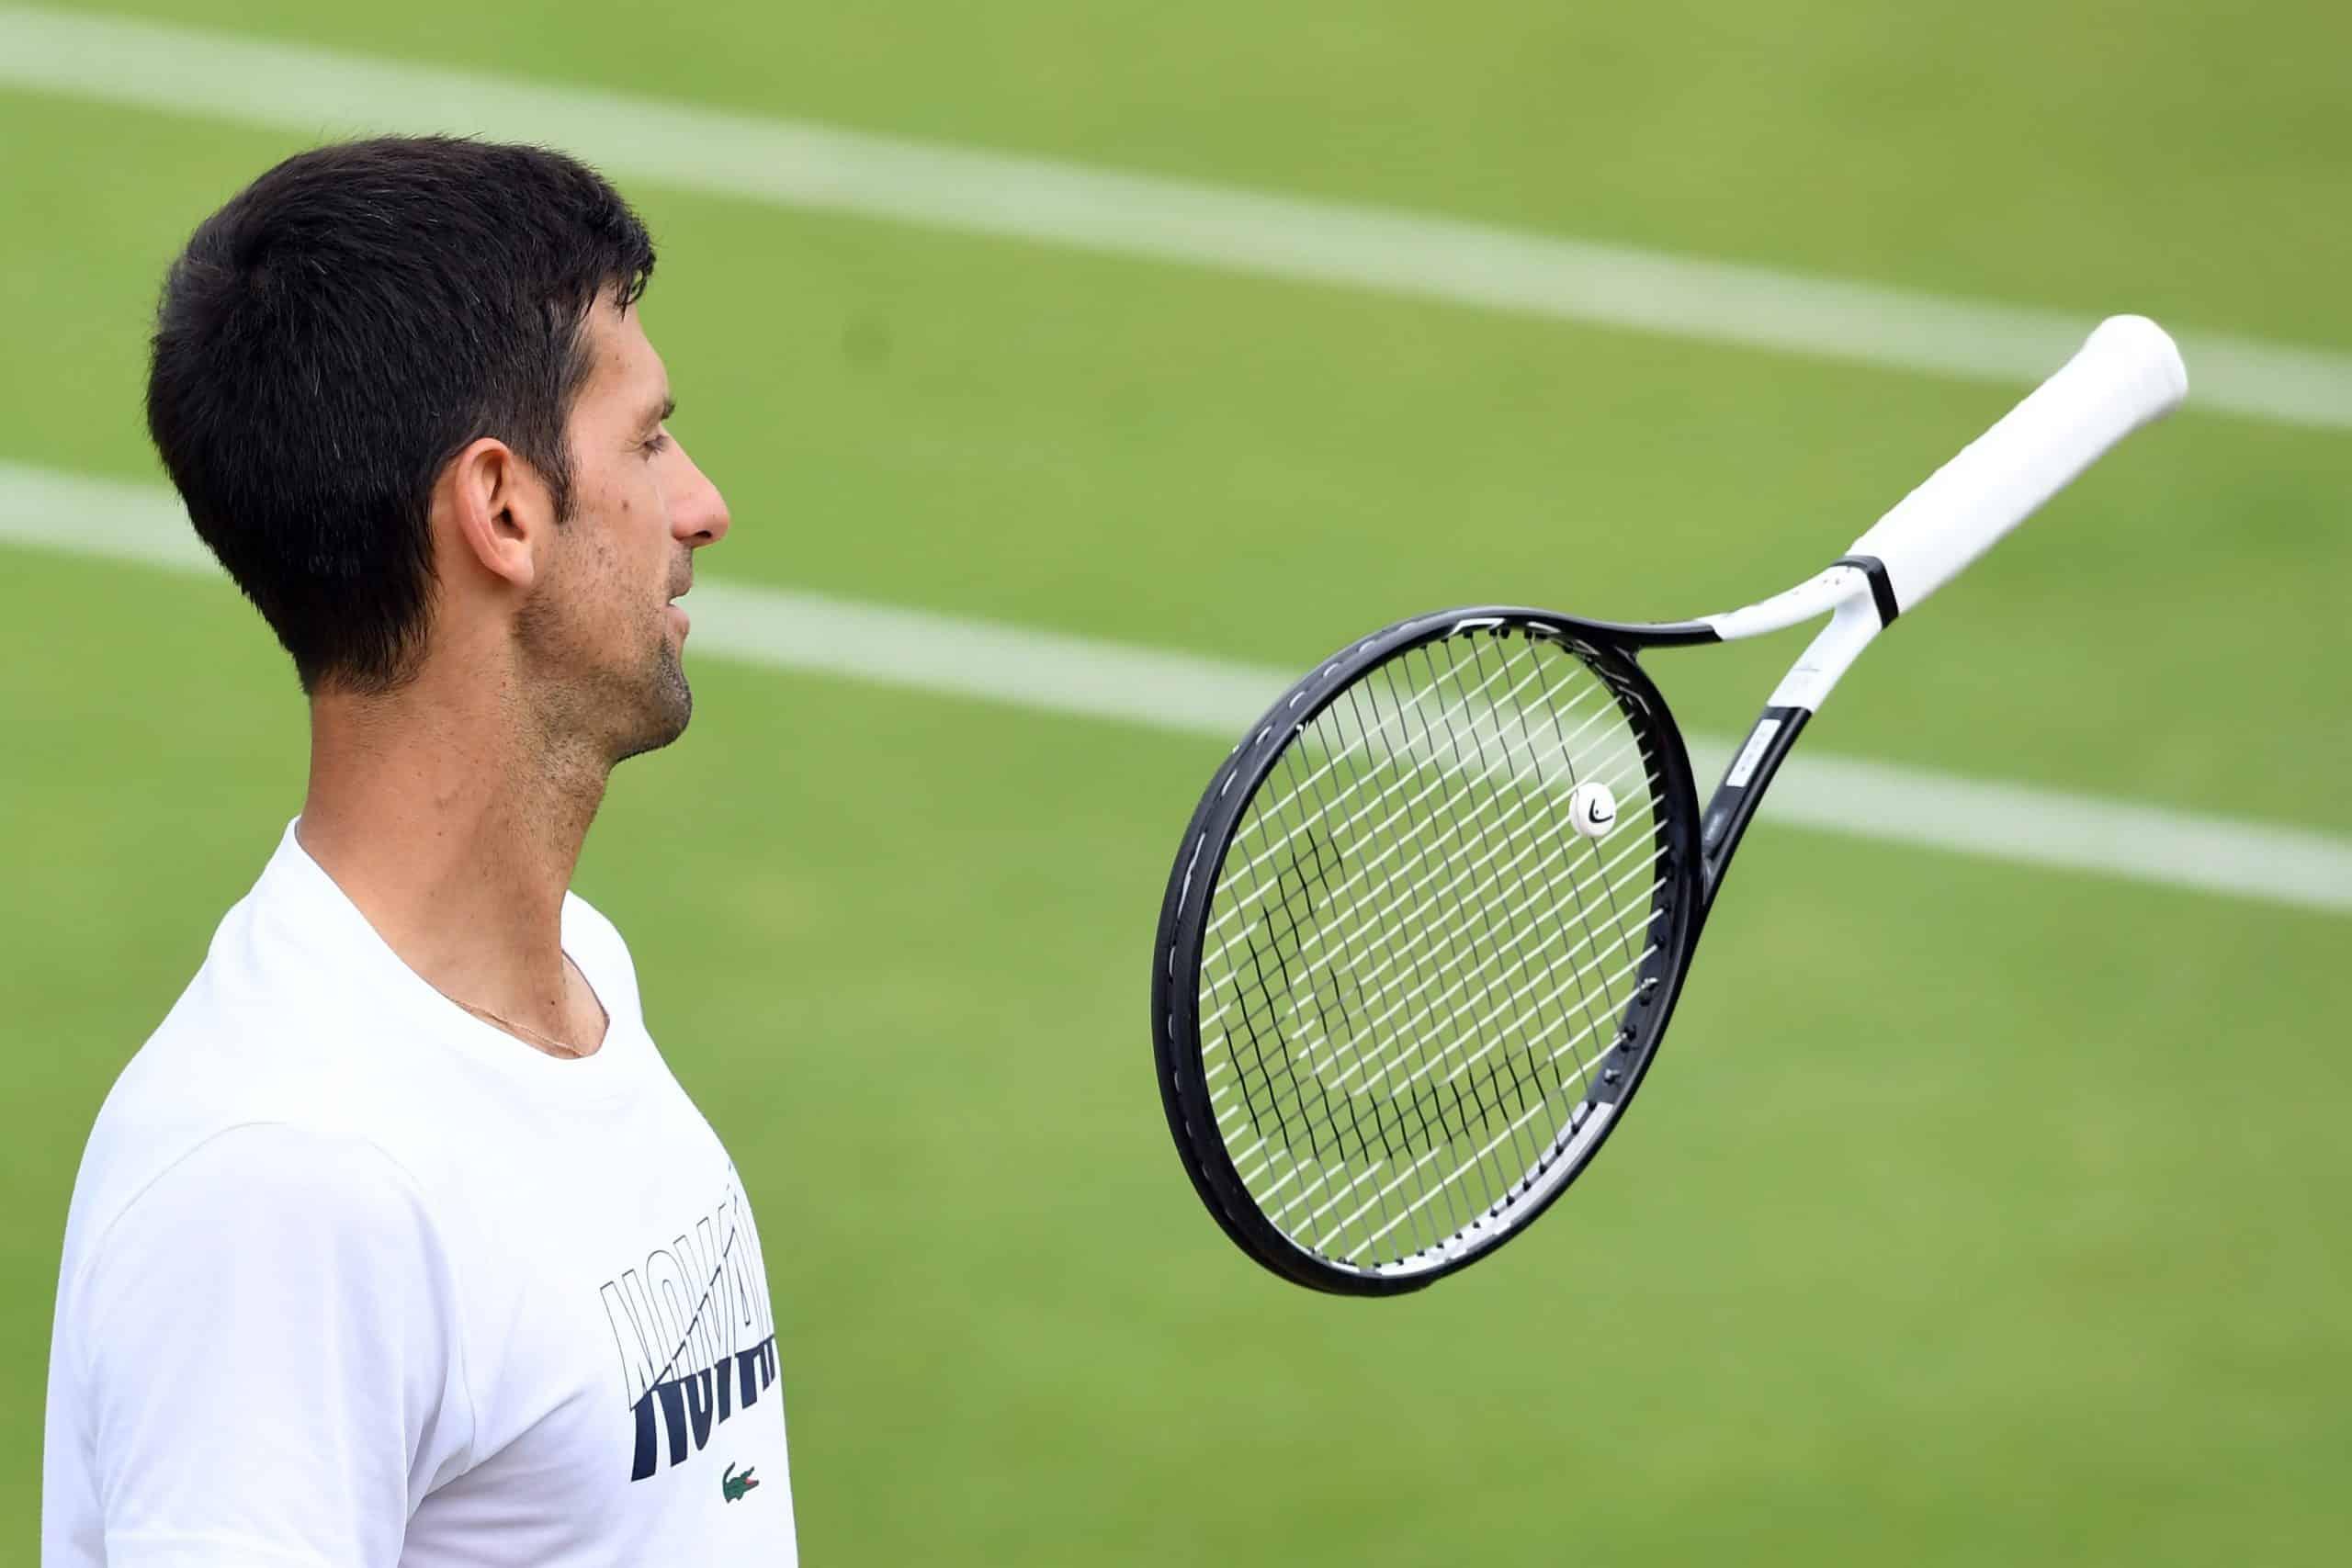 Djokovic Head Pro Stock Racquet